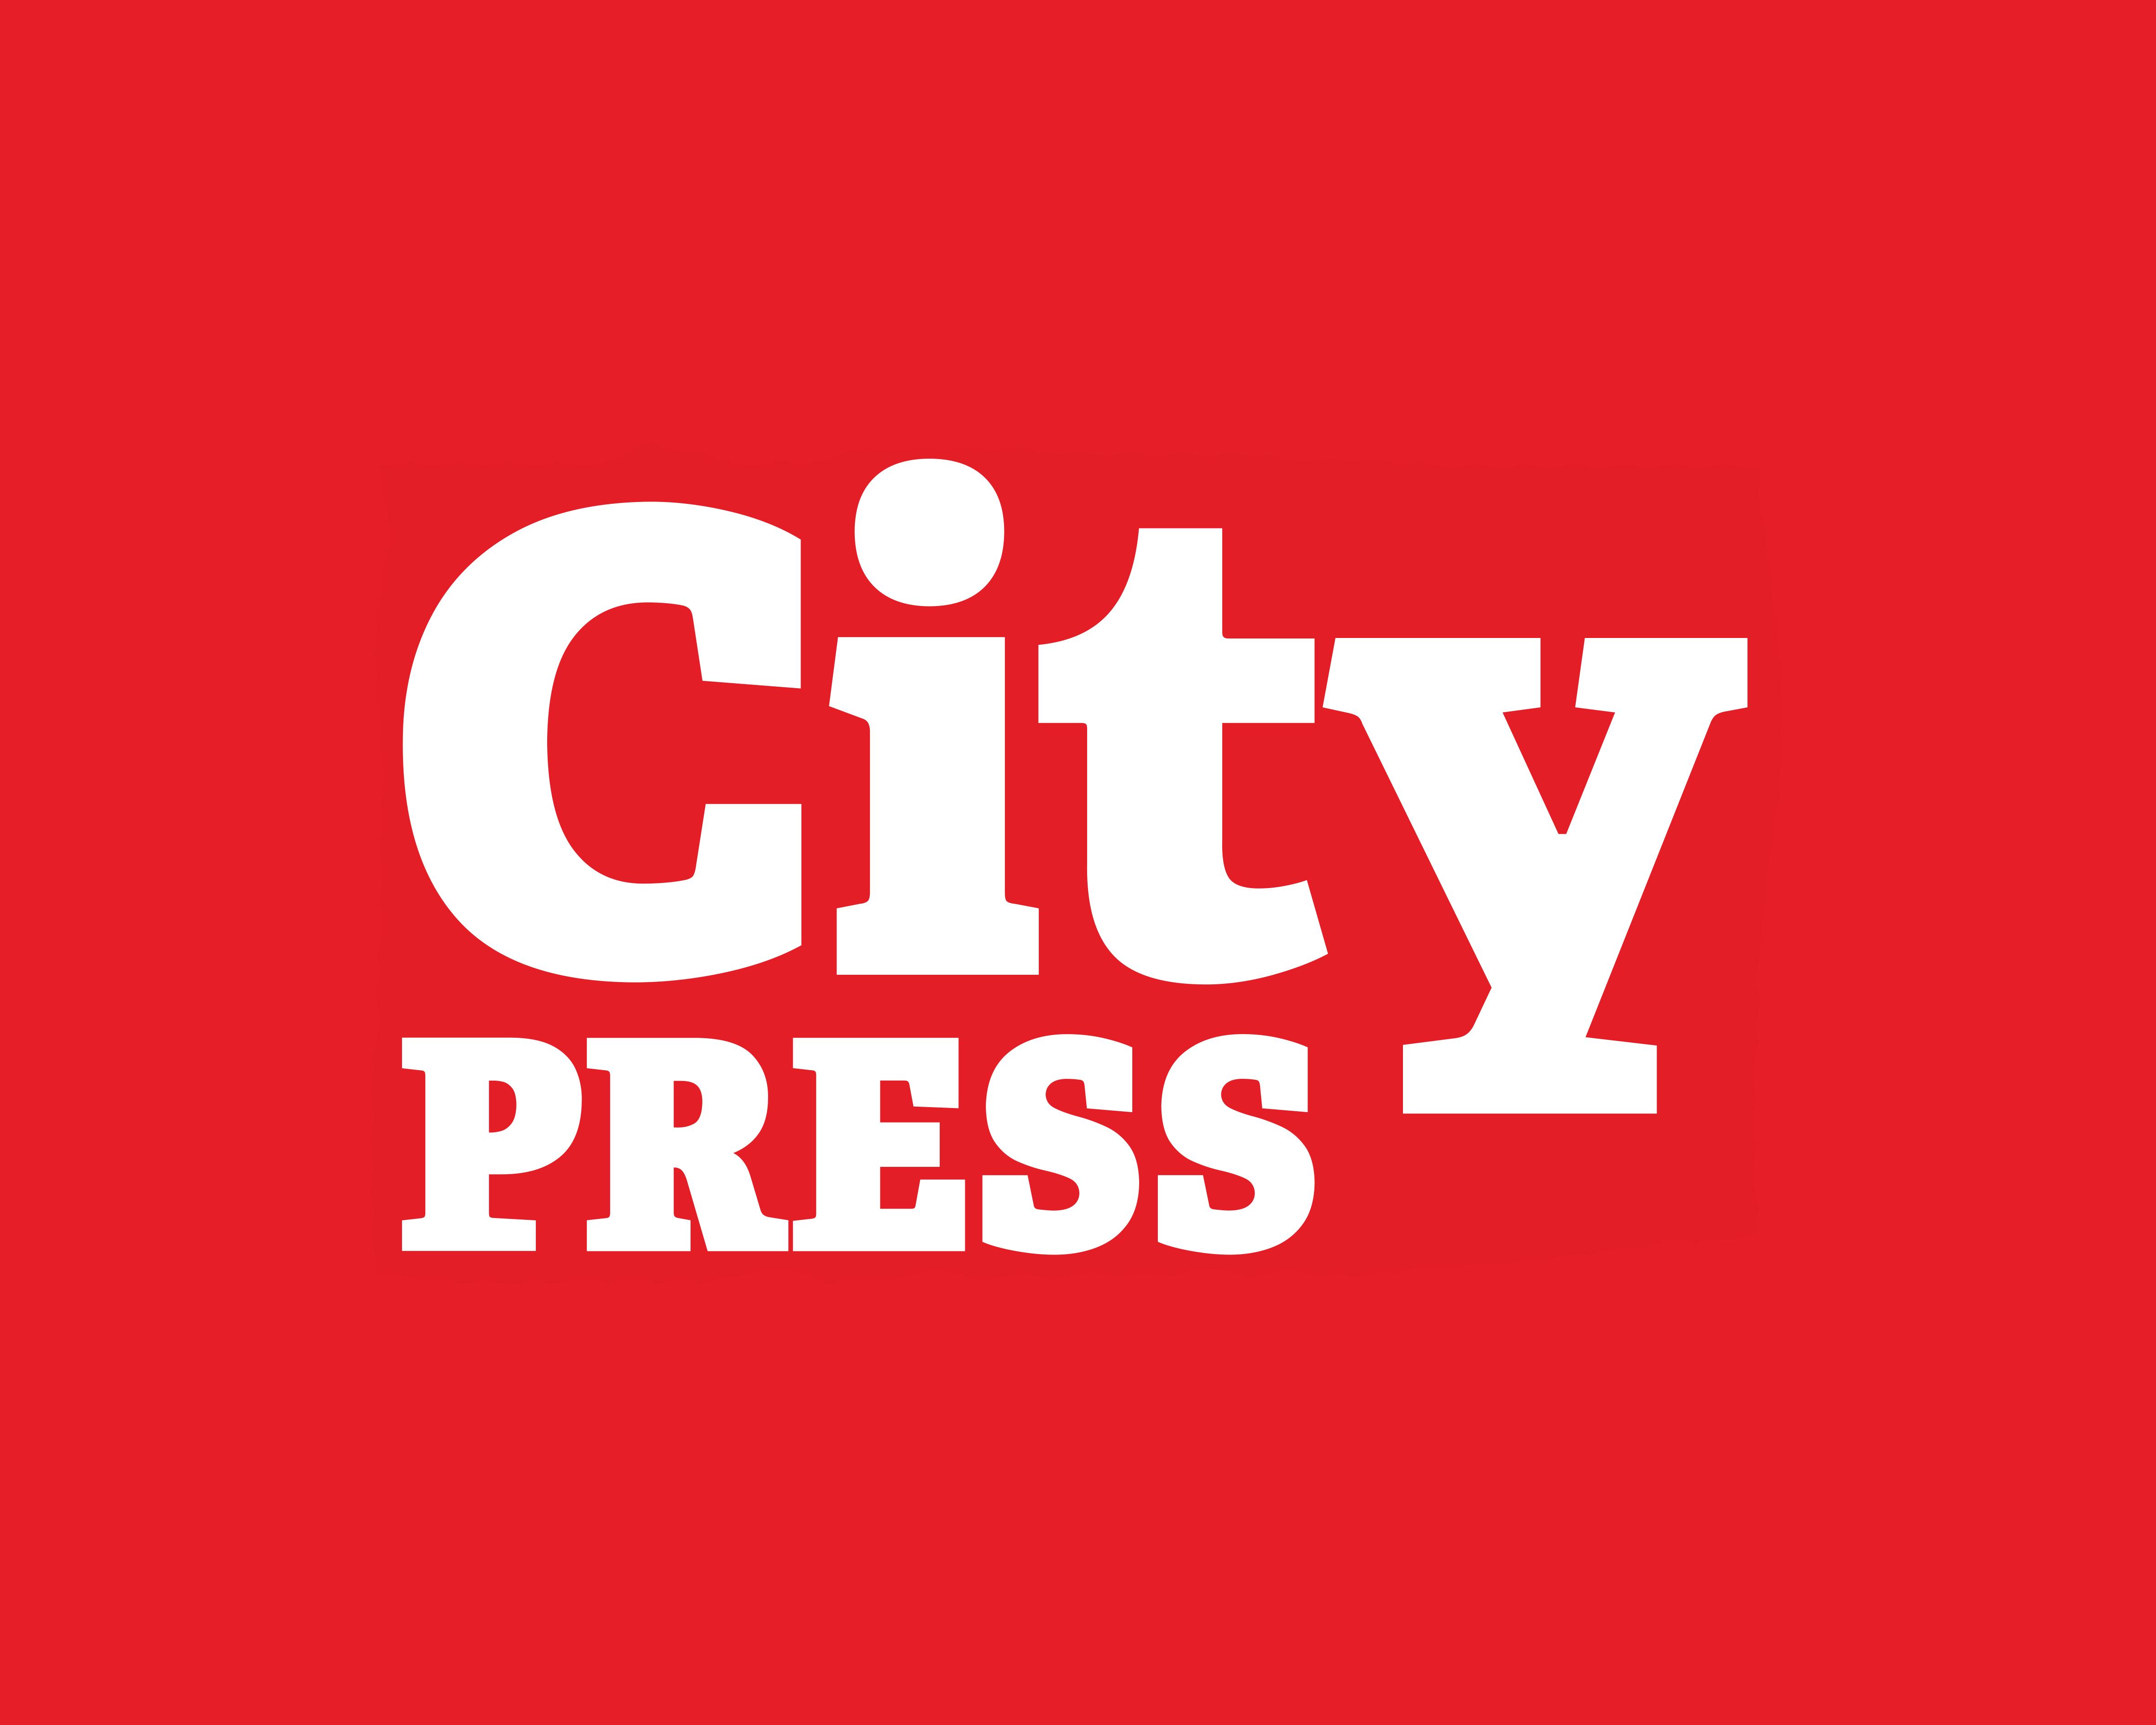 citypress dating